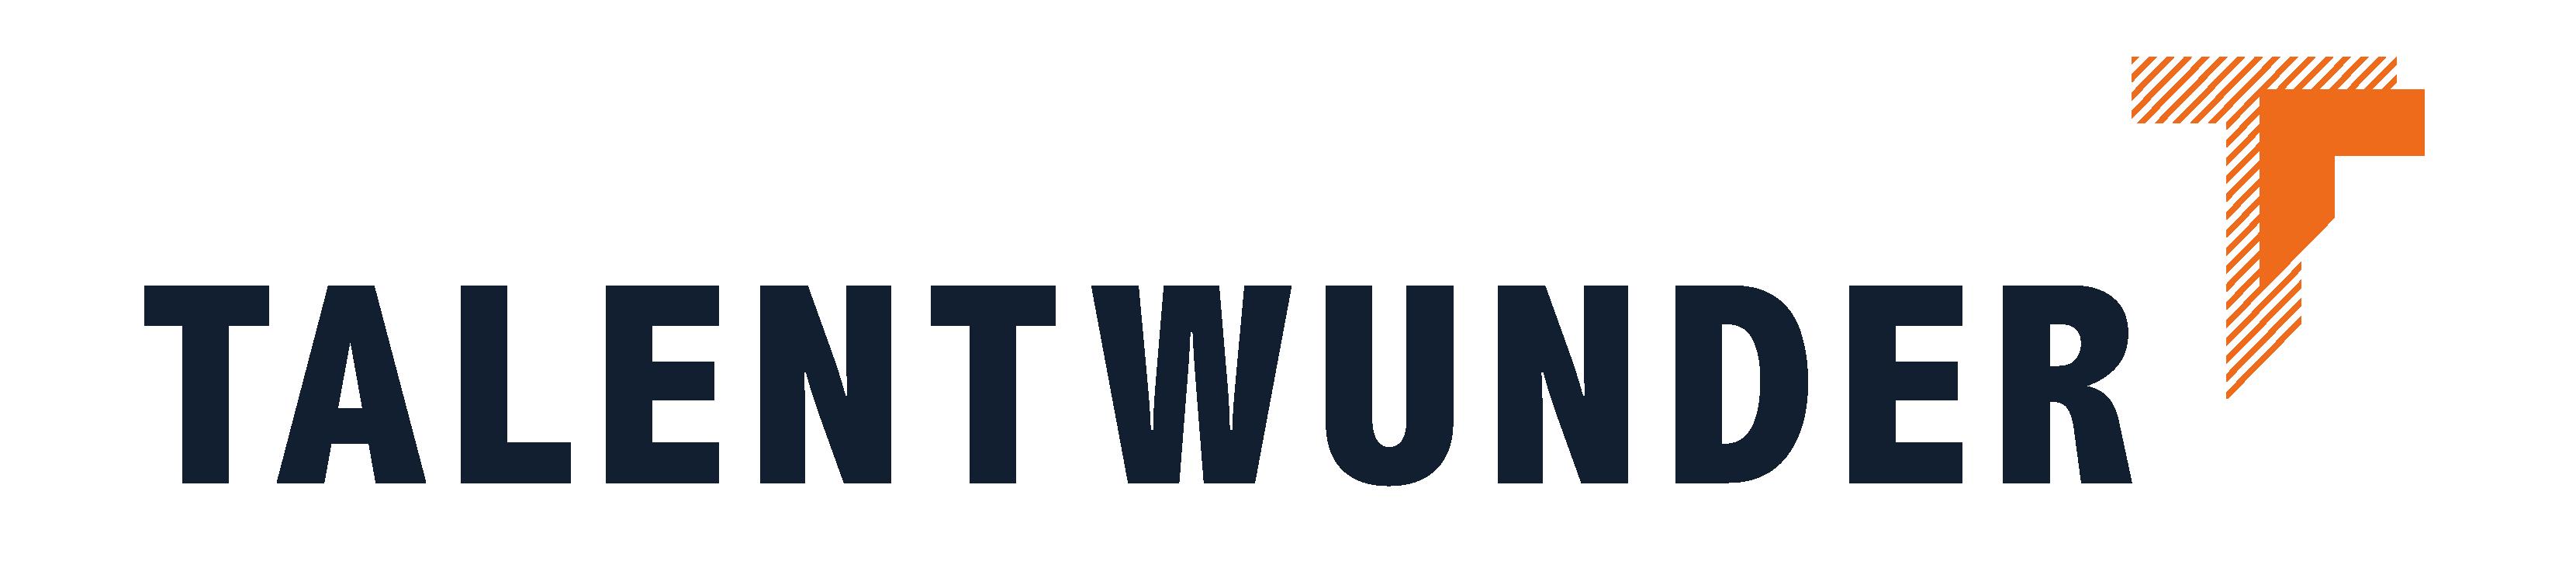 Talentwunder Logo